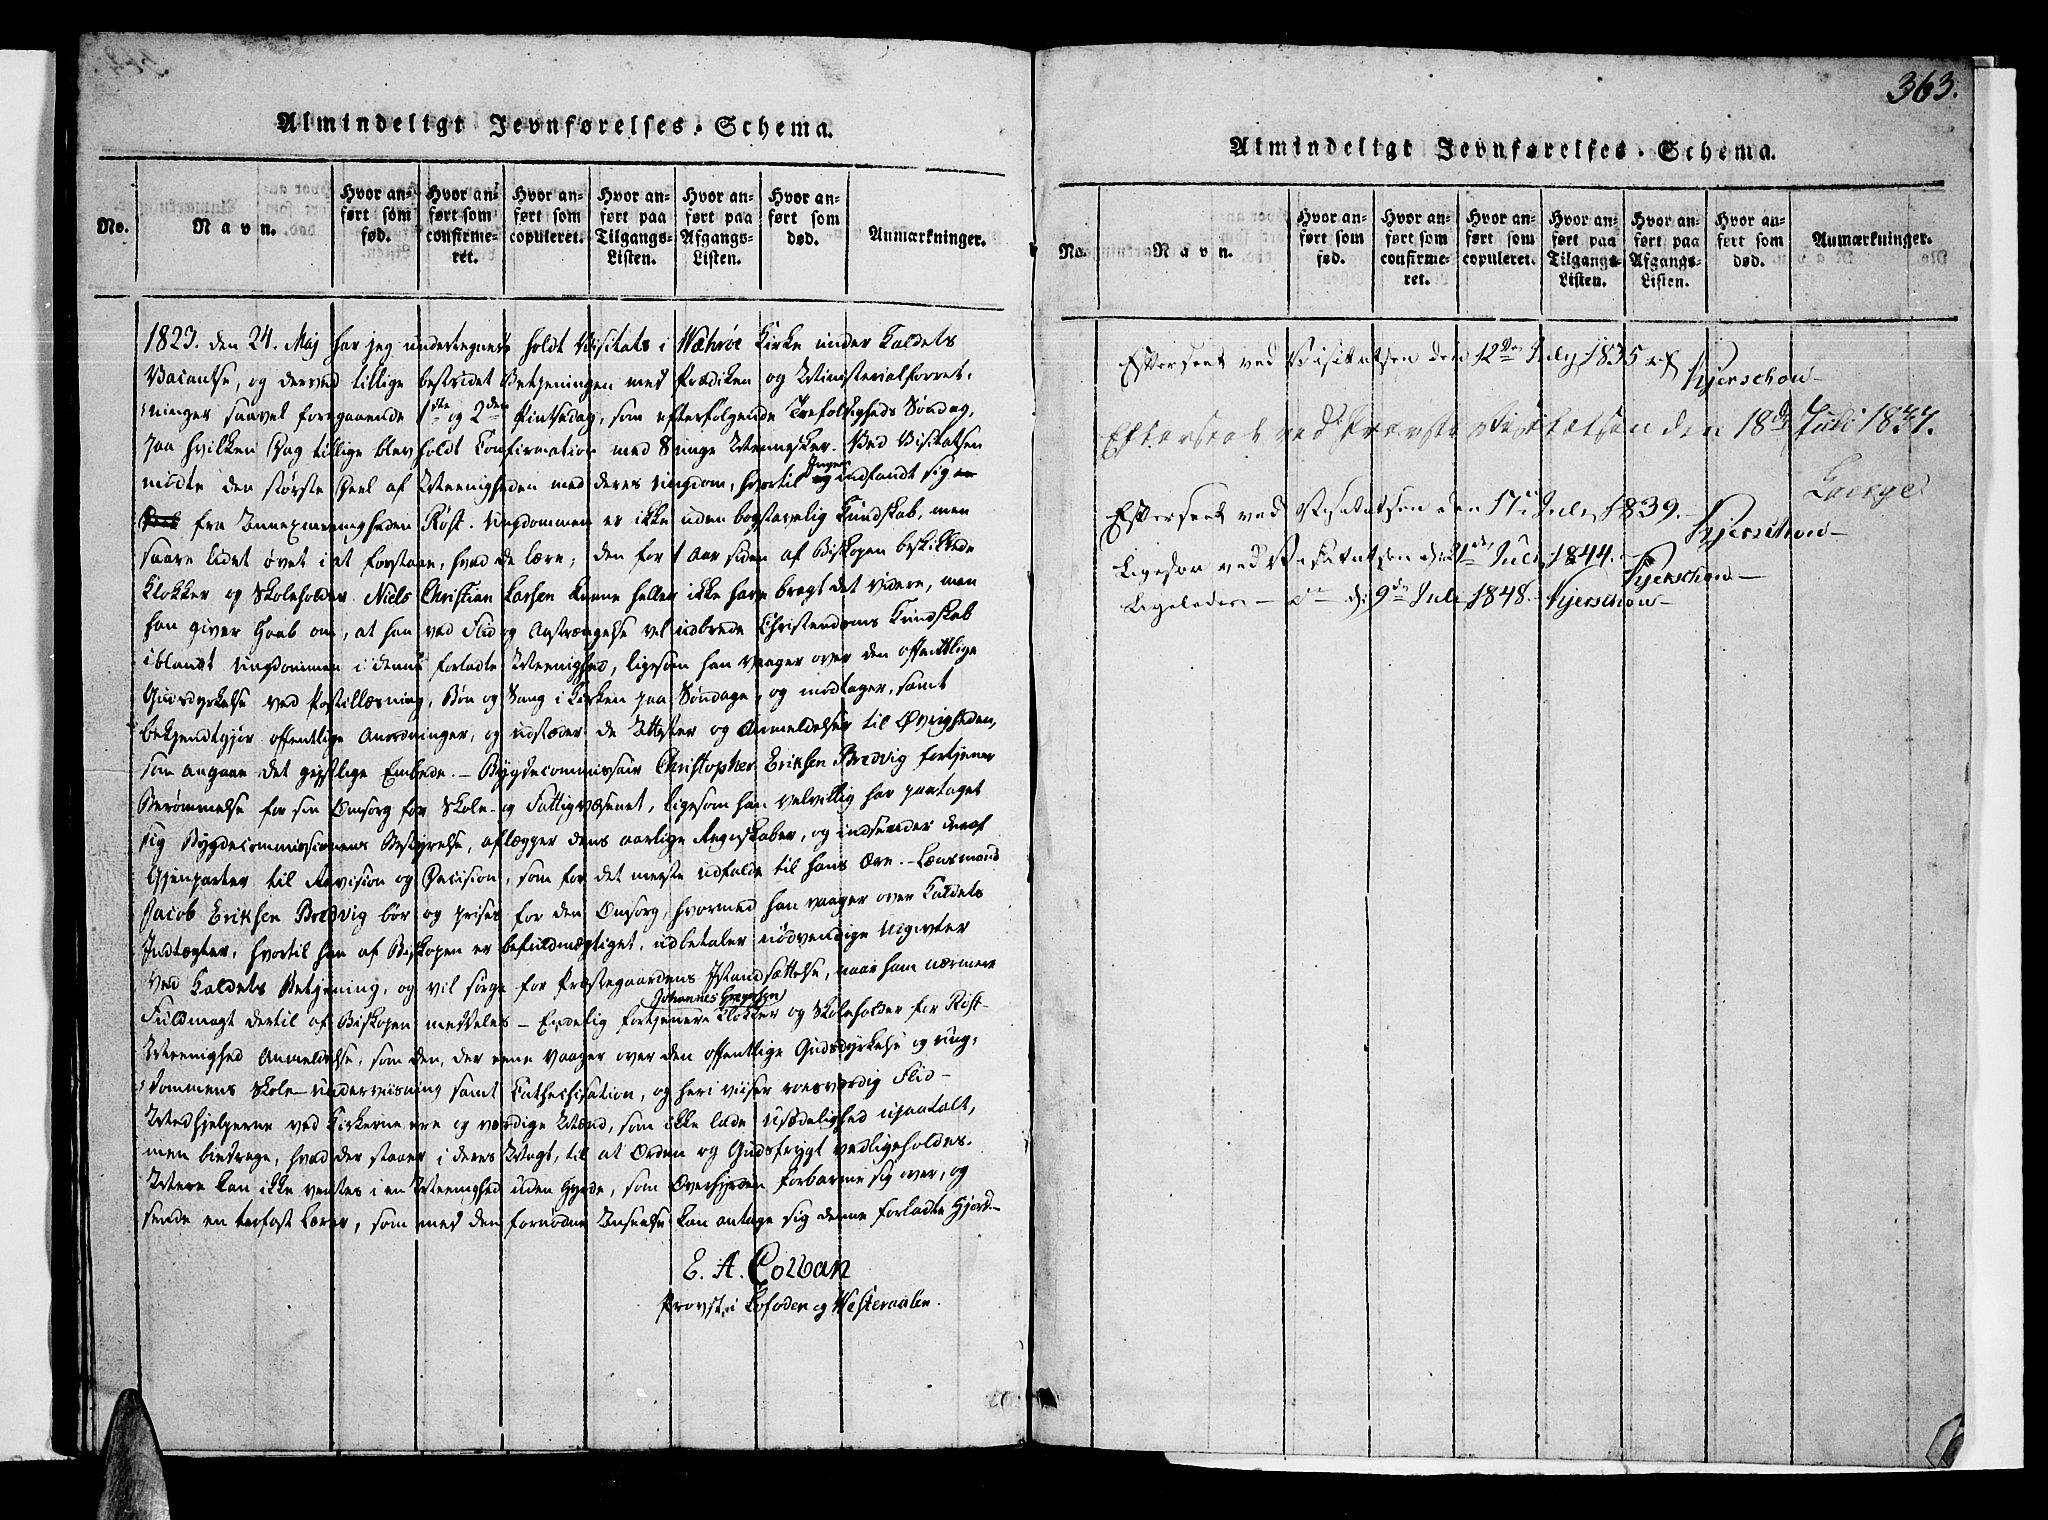 SAT, Ministerialprotokoller, klokkerbøker og fødselsregistre - Nordland, 807/L0120: Ministerialbok nr. 807A03, 1821-1848, s. 363